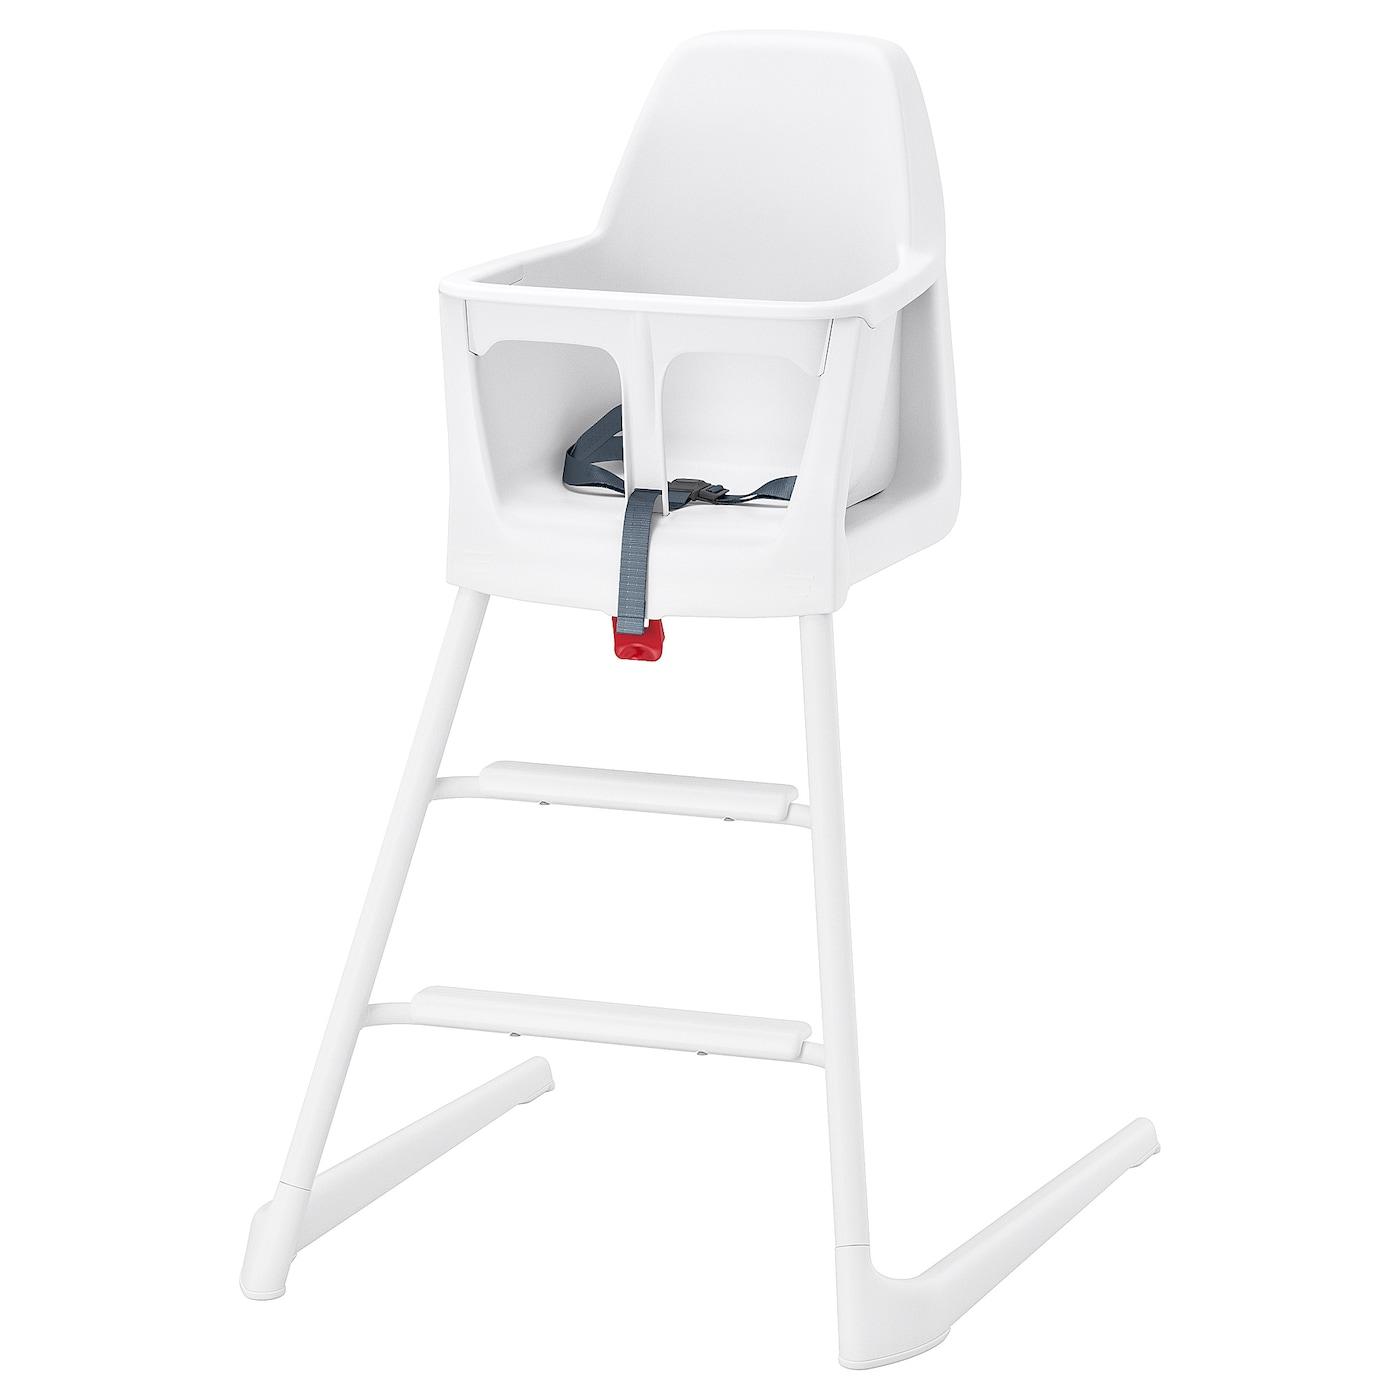 LANGUR Chaise hauteenfant, blanc IKEA